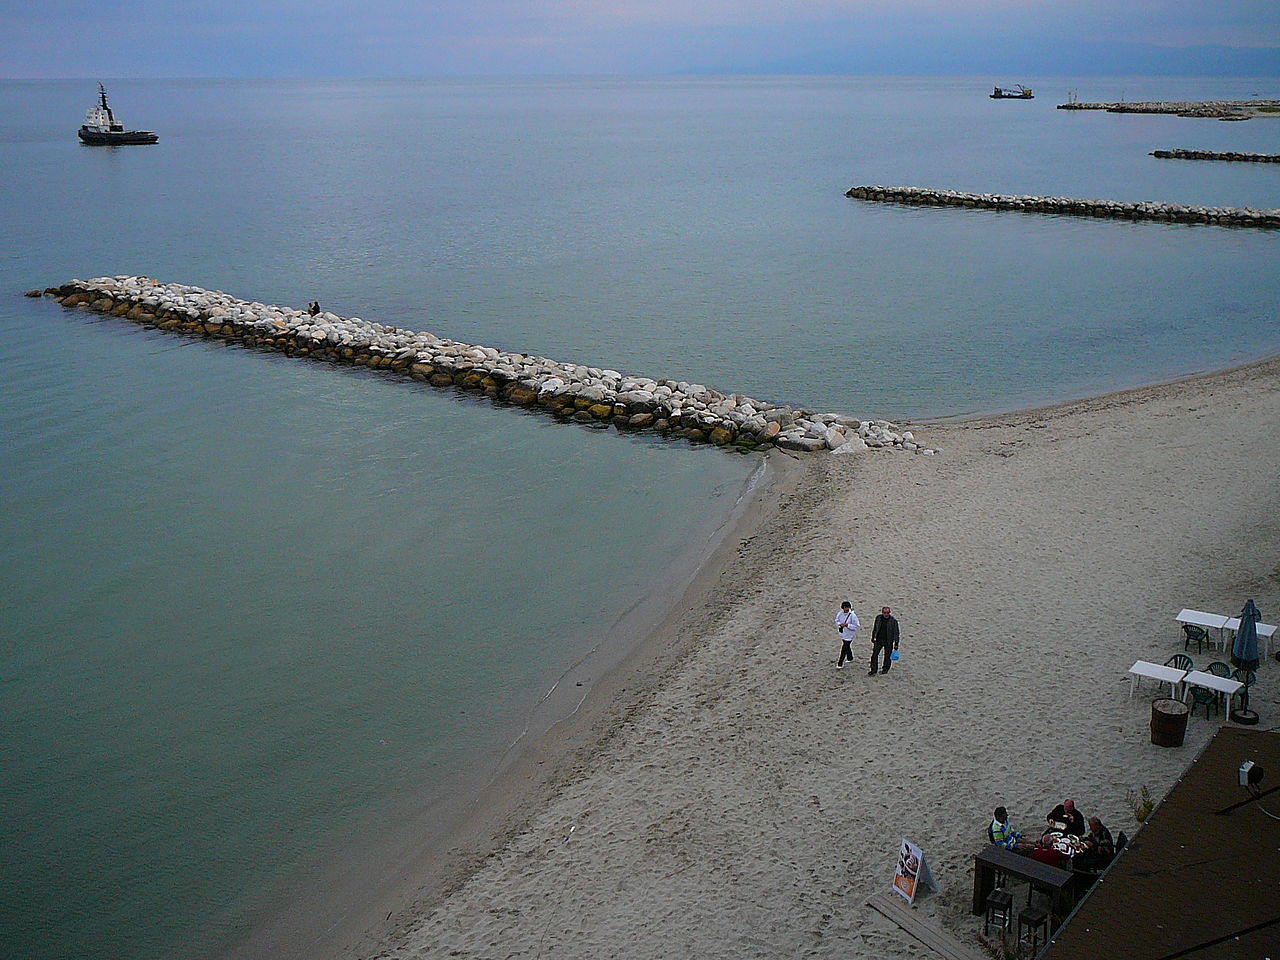 Noleggio Barche Paralia - Navalia | Noleggia un Sogno